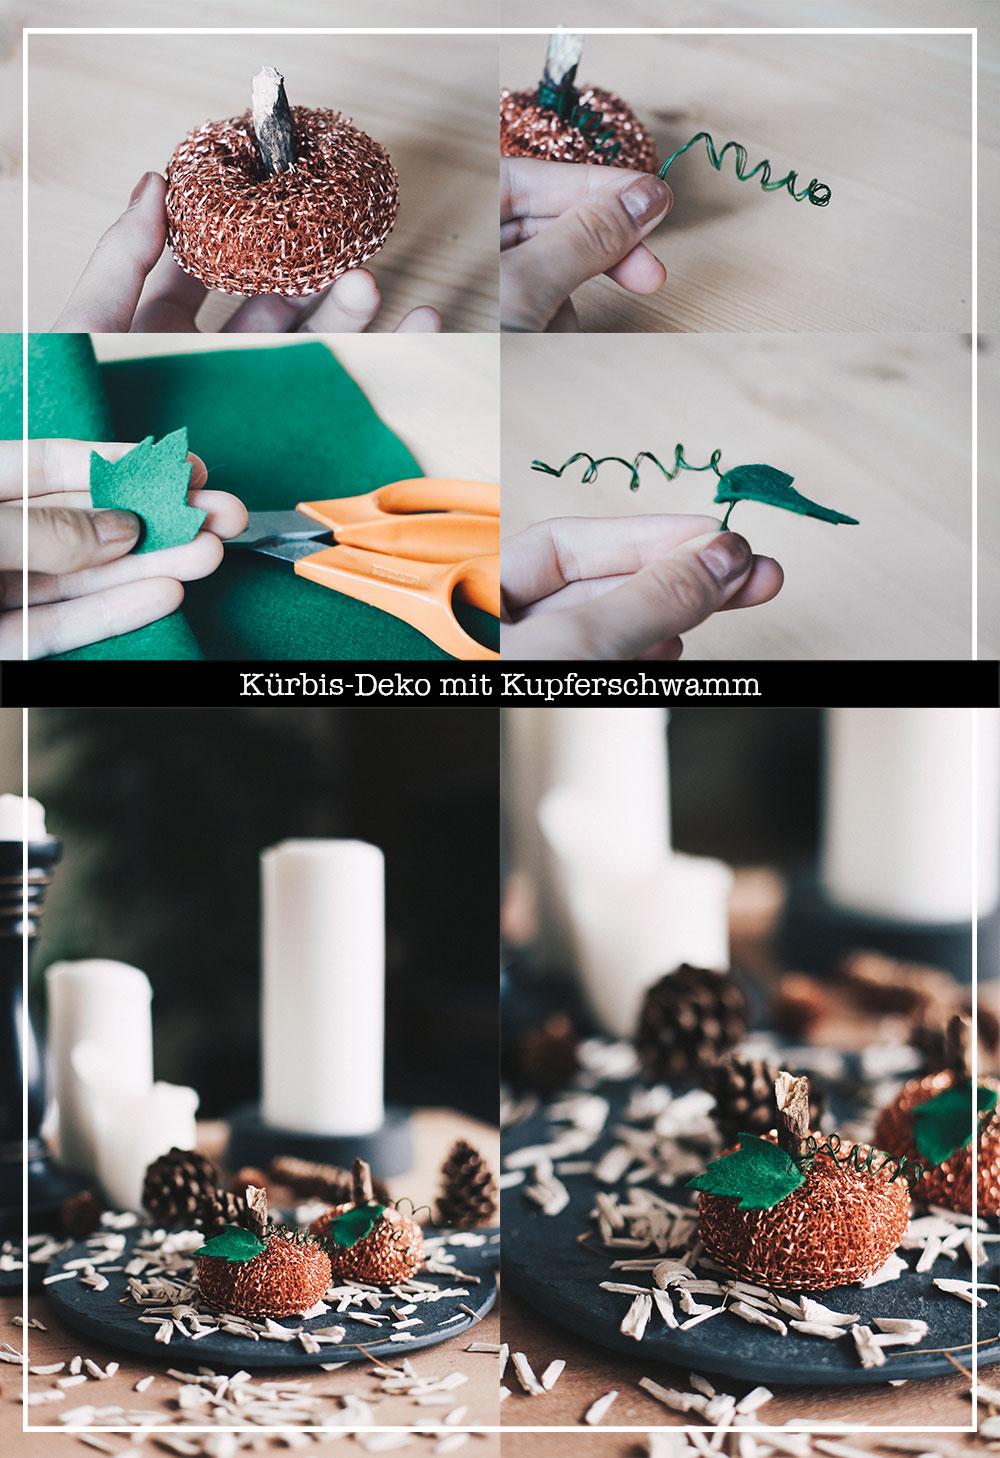 Herbst-DIY, Kürbis-Deko, Halloween, Herbst Dekoration selber machen, Interior Blog, Interior Magazin, whoismocca.com